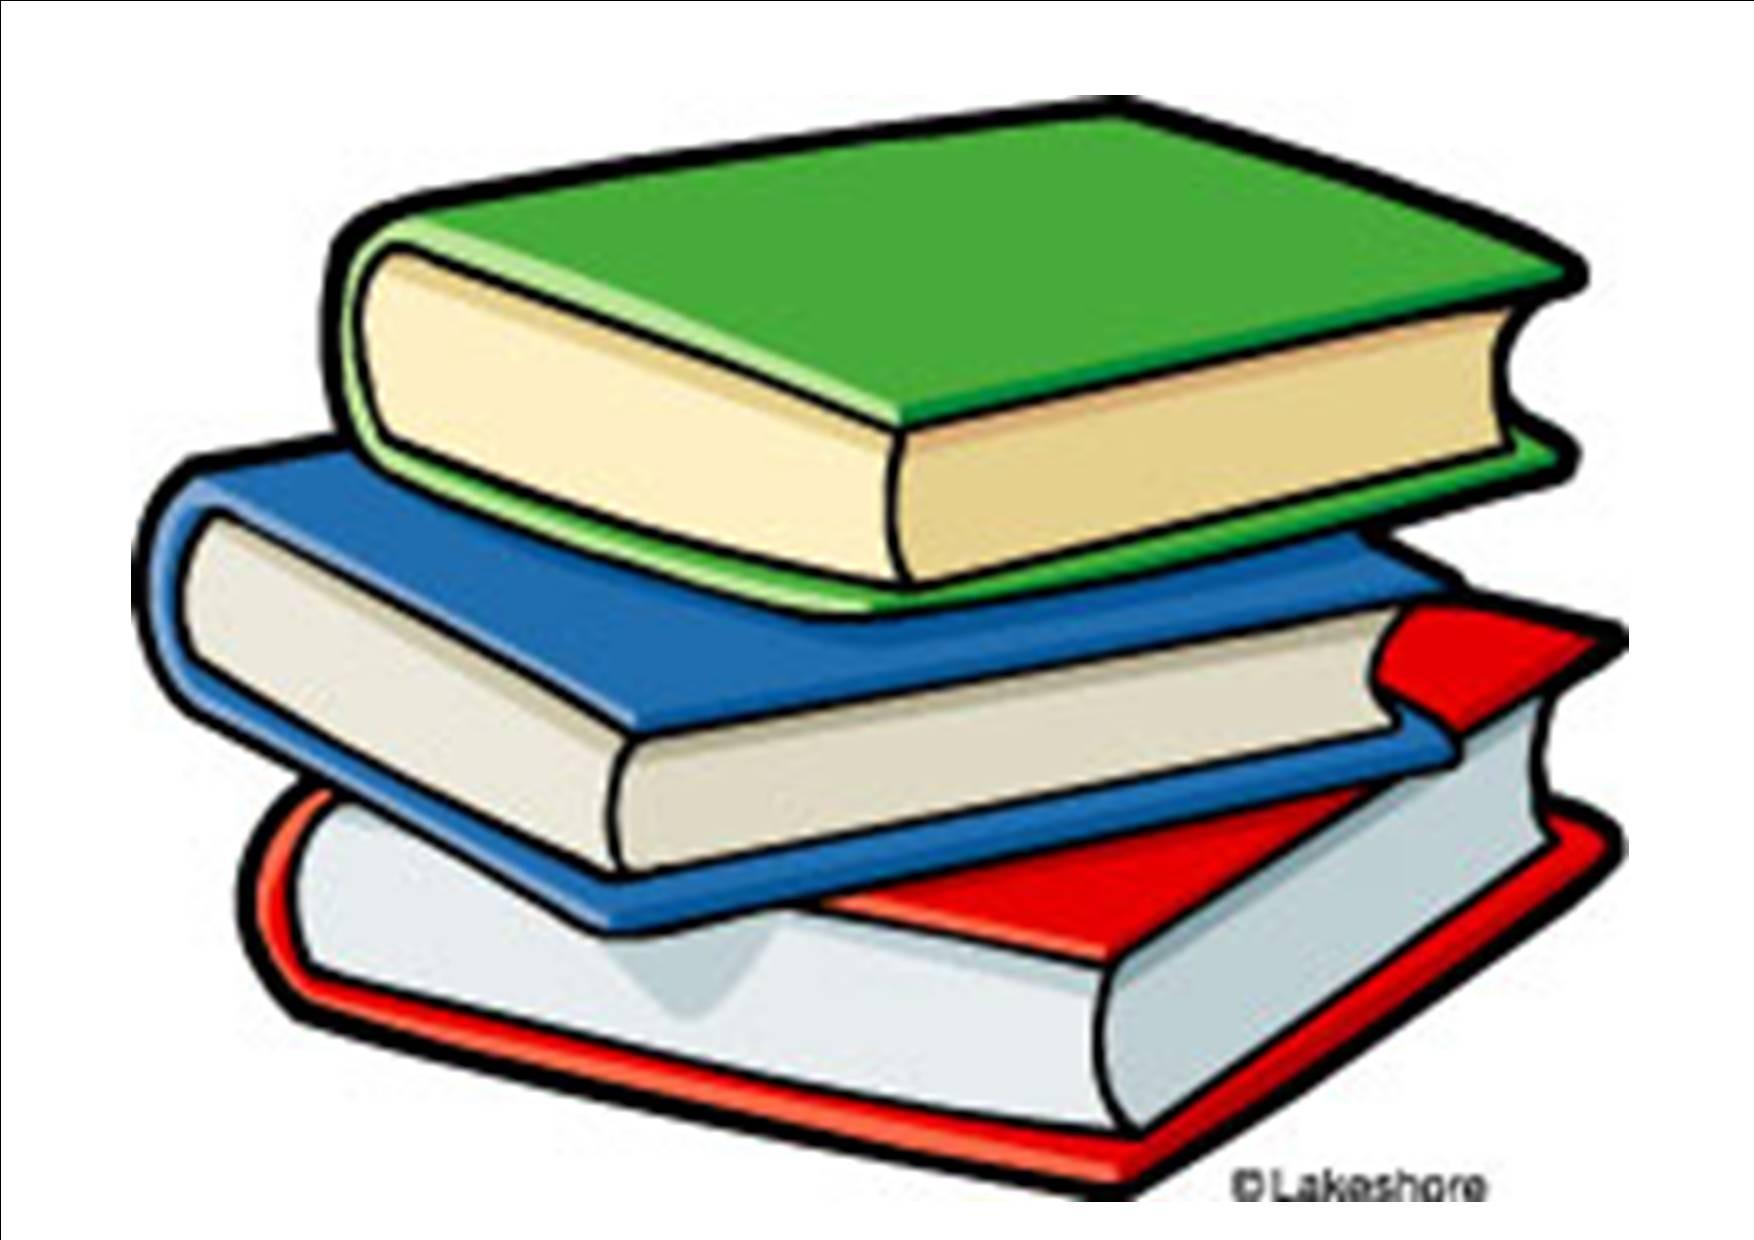 Best Accounting Journals Cambridge Journals Official Web School Clipart Education Clip Art School For Teachers 4